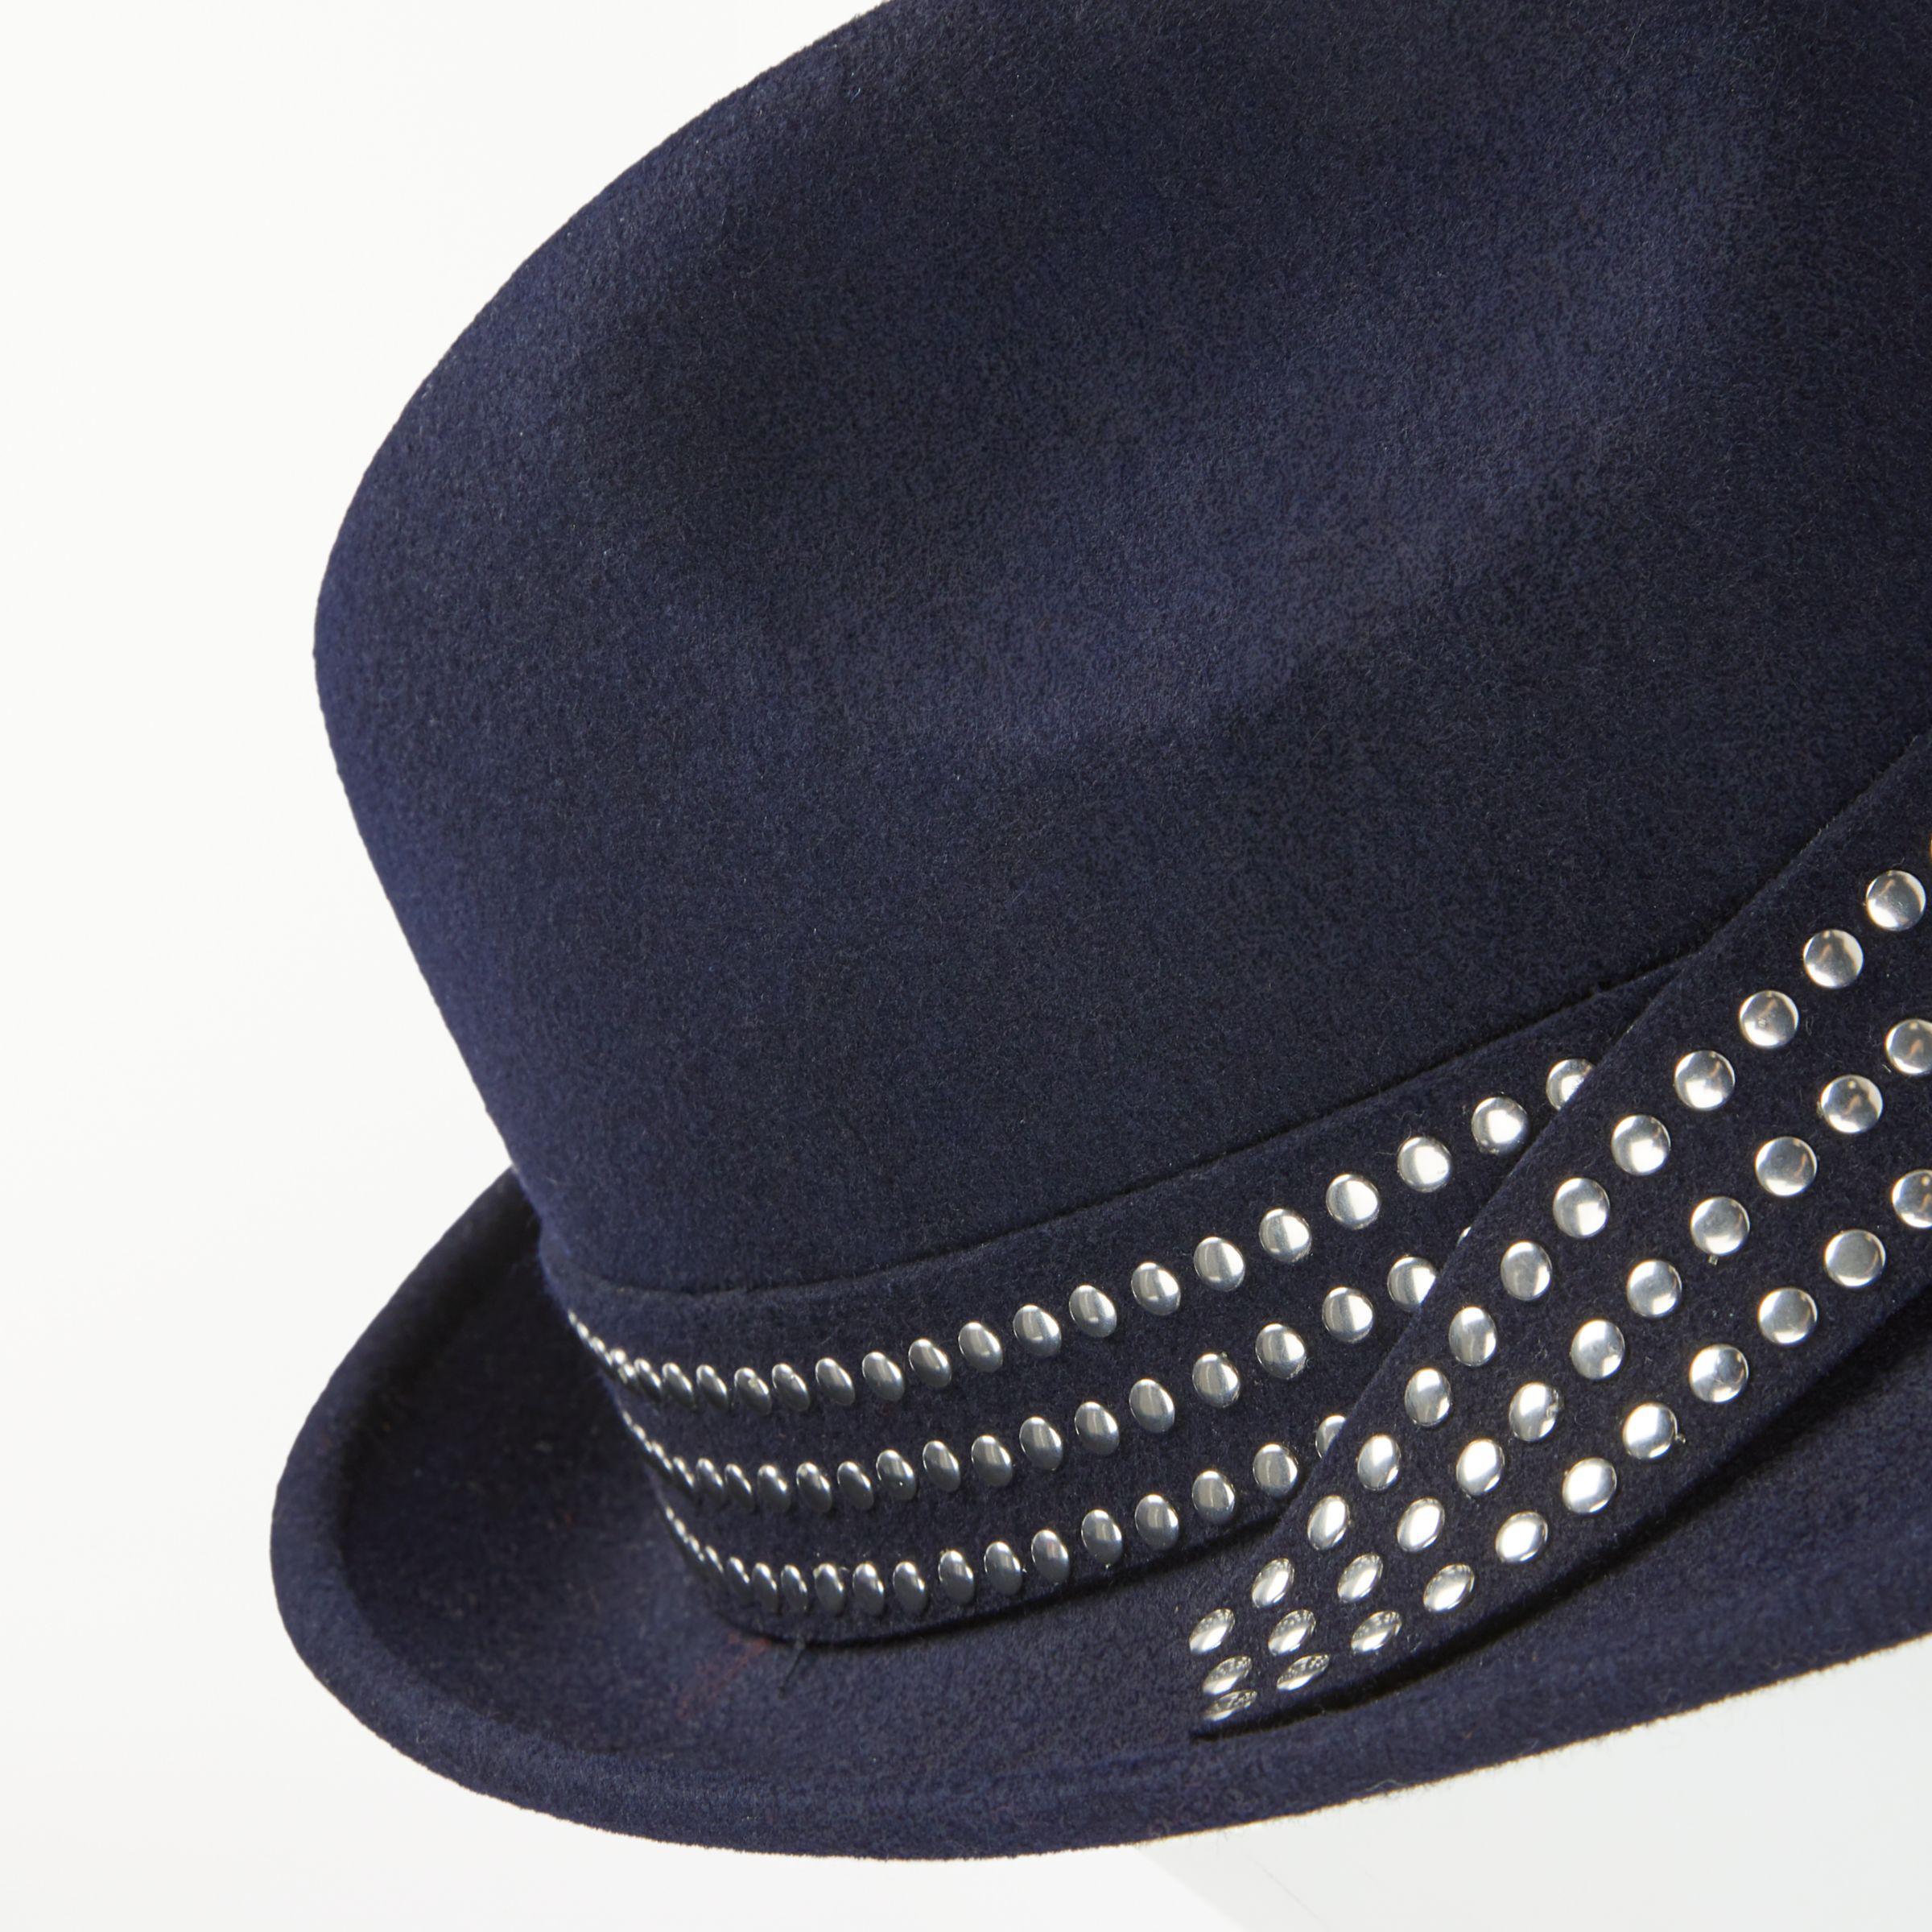 891c7eeefd3 John Lewis Stud Trim Woollen Trilby Hat in Blue - Lyst